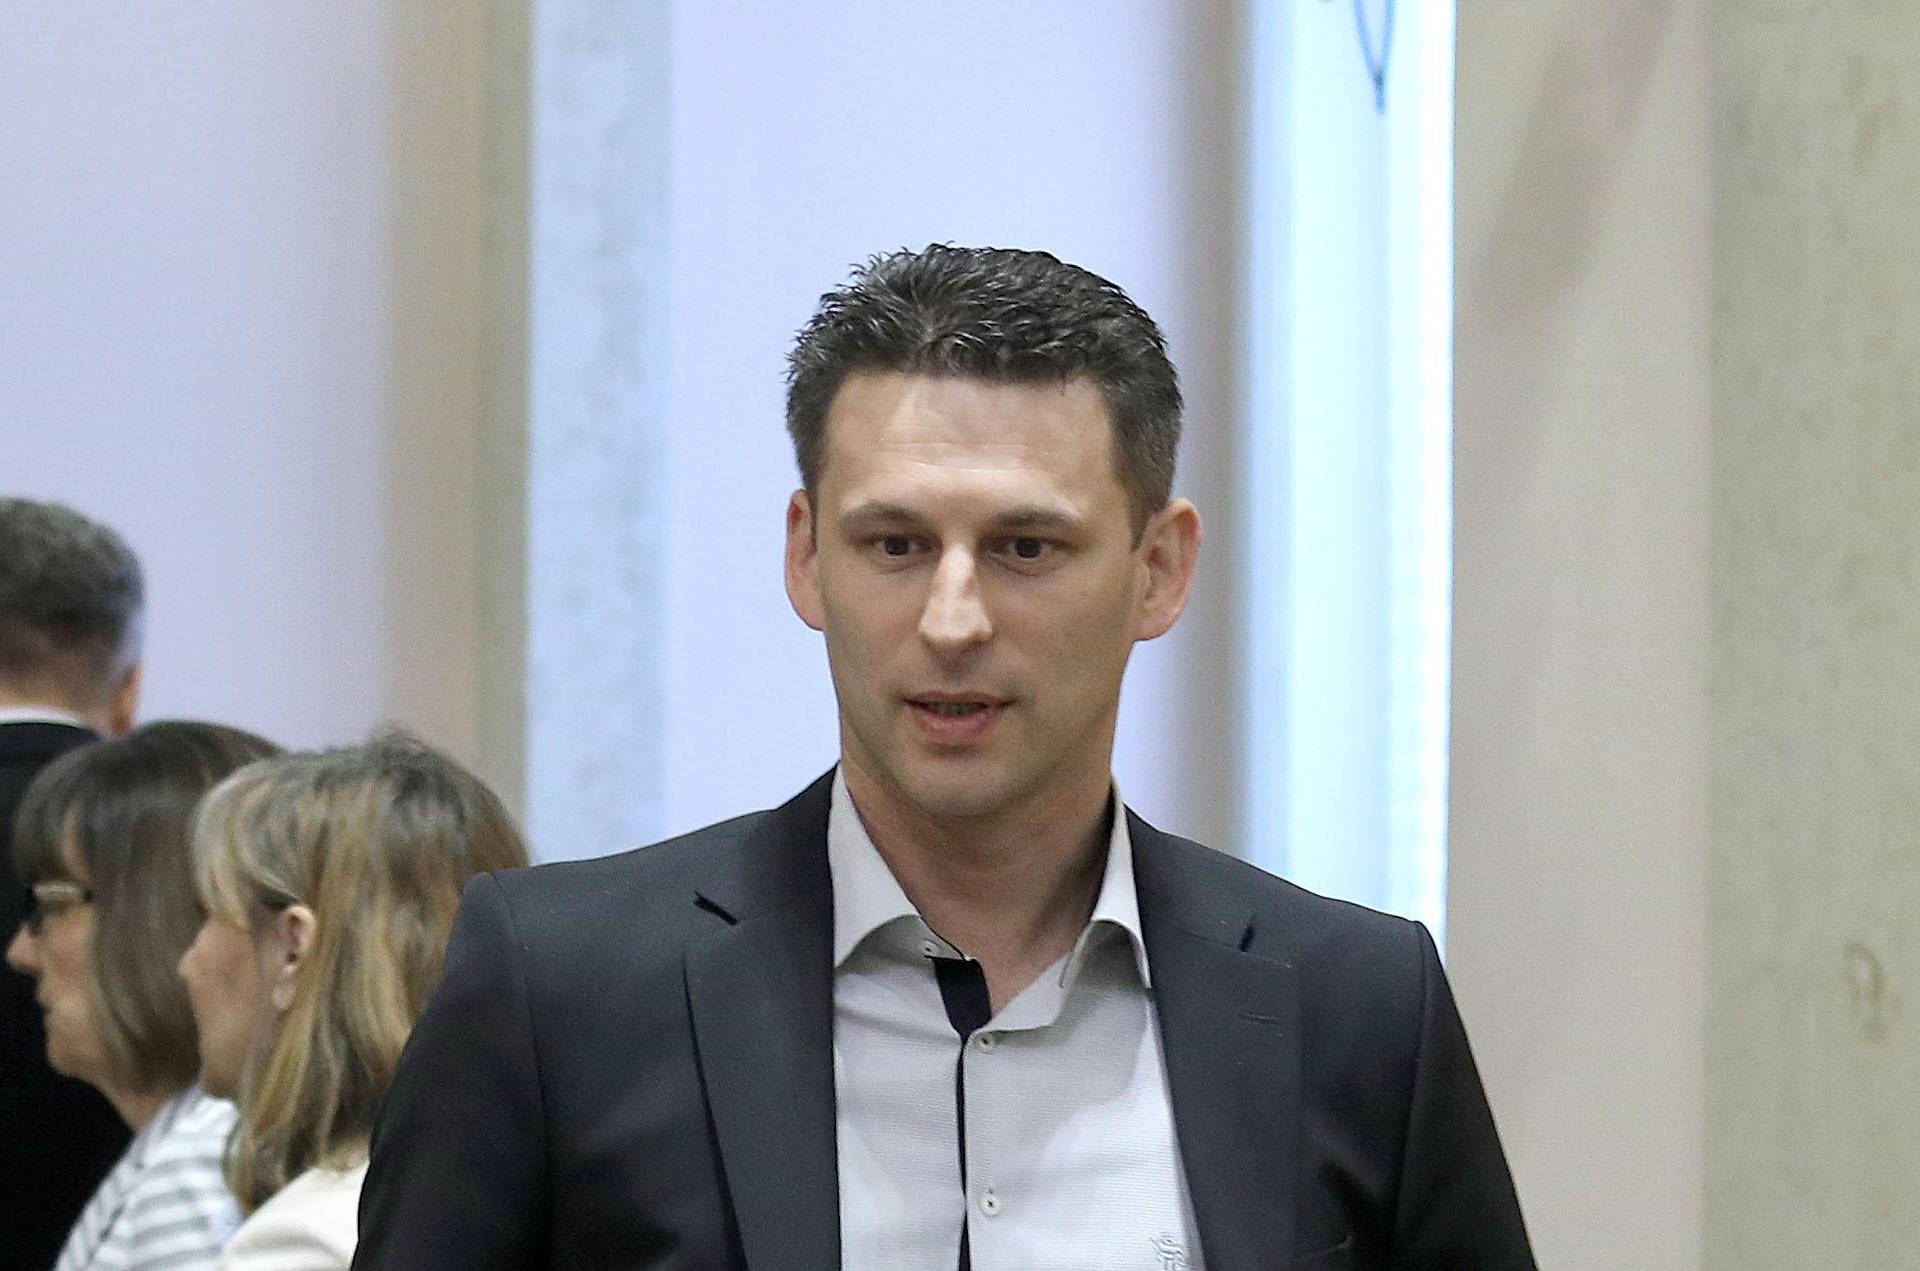 'Hrvatska mora proglasiti isključivi gospodarski pojas...'